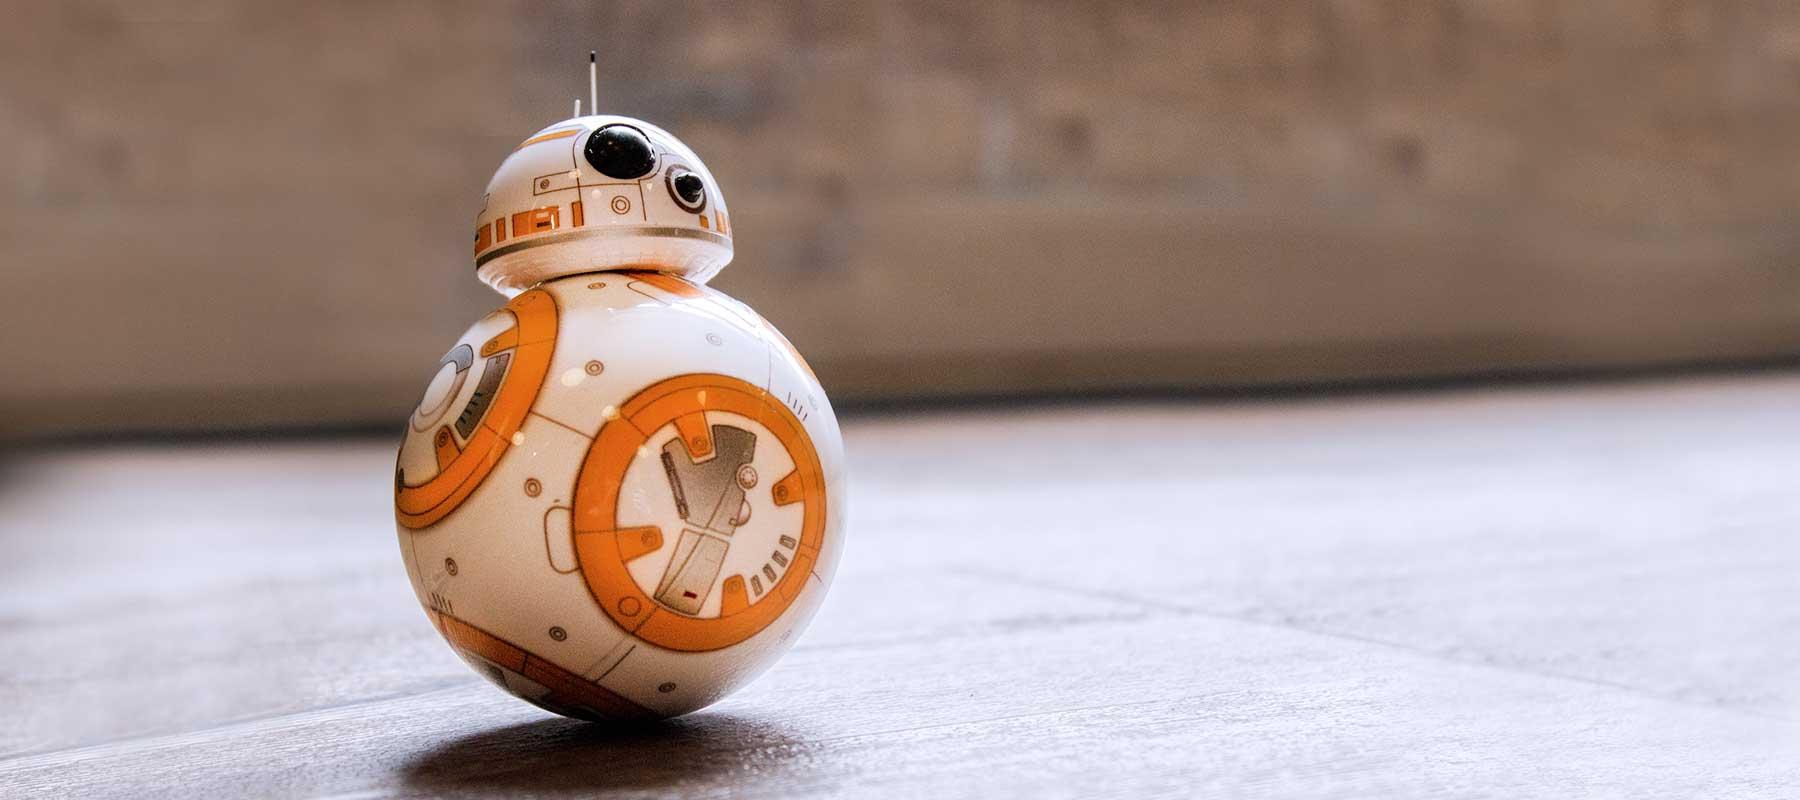 Image: BB-8